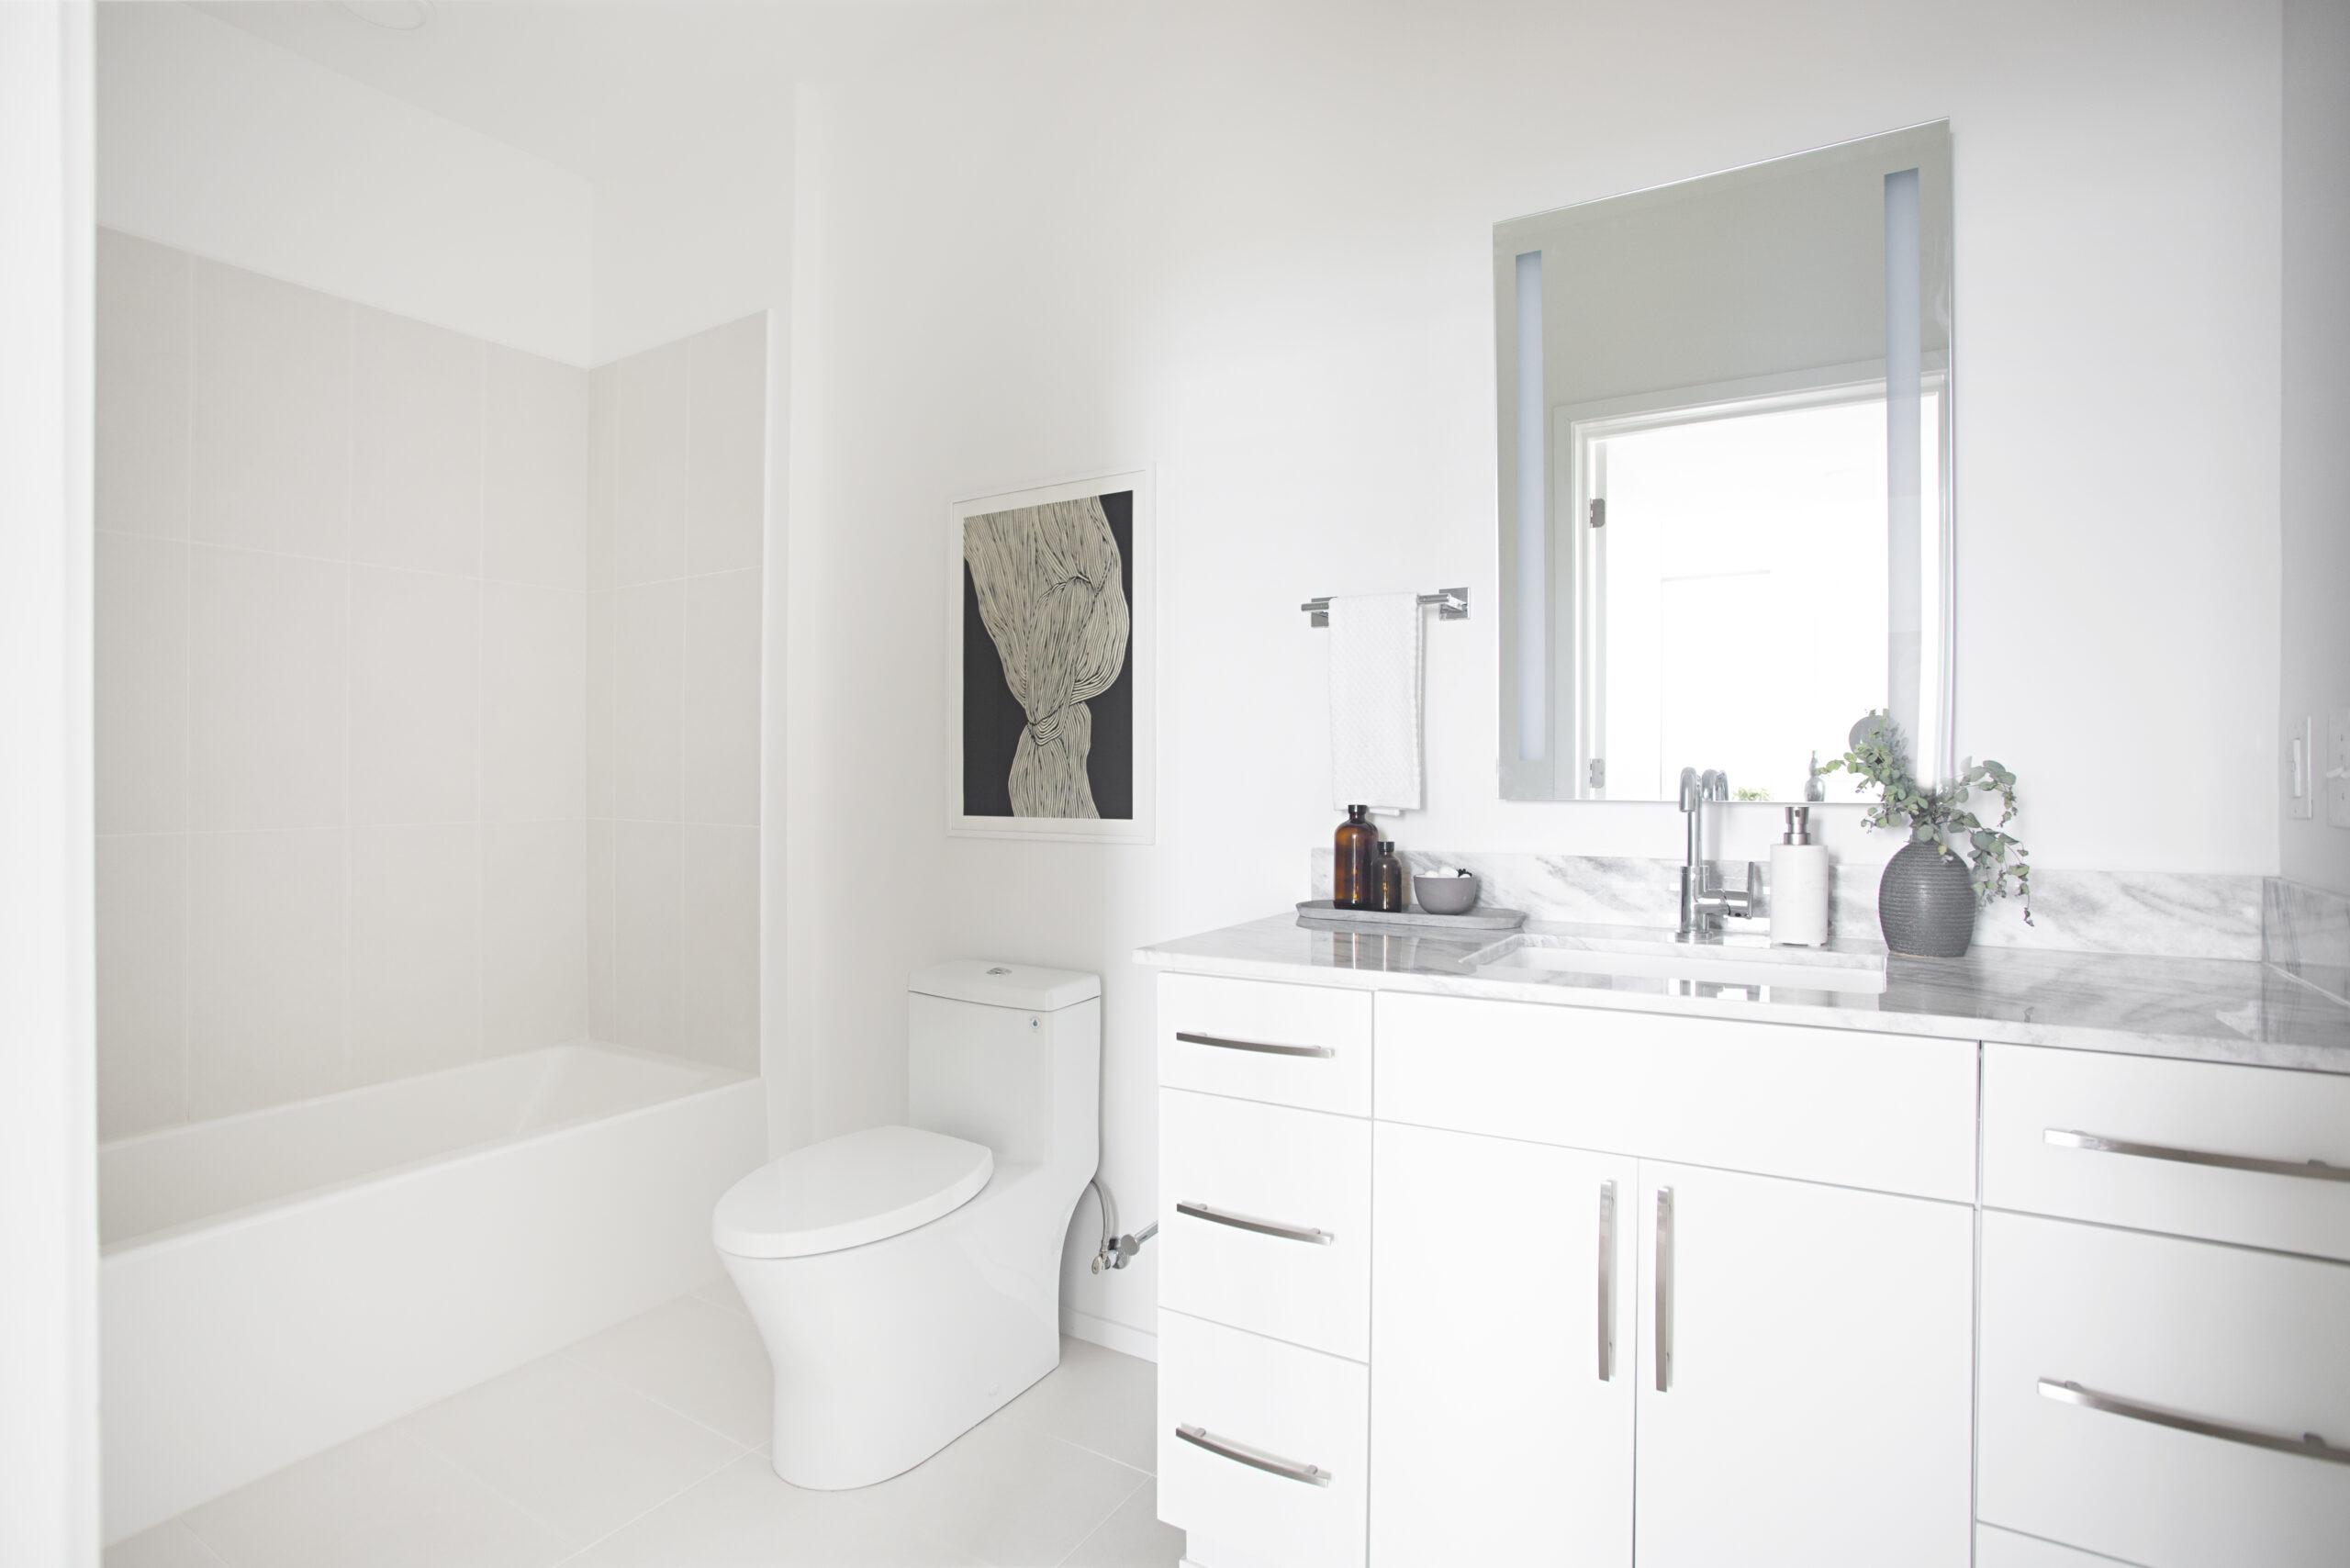 92-Mayker-Interiors-Home-Staging-Furniture-Rentals-Modern-Design-Decor-Nashville-Alina-Model-Unit